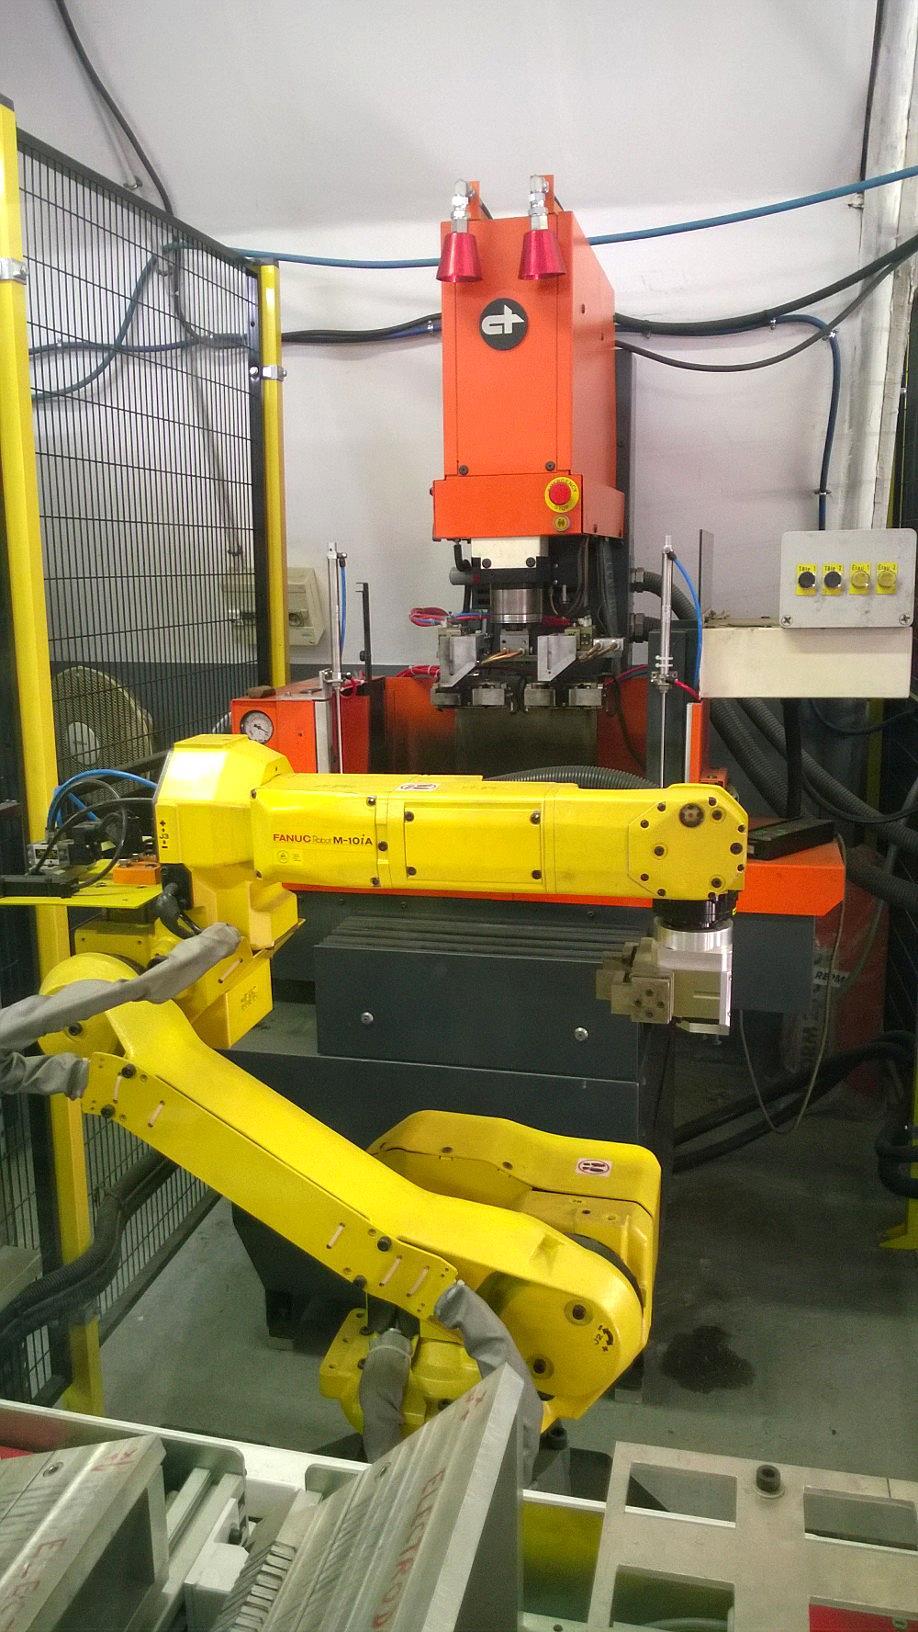 Manual Robot fanuc m10ia